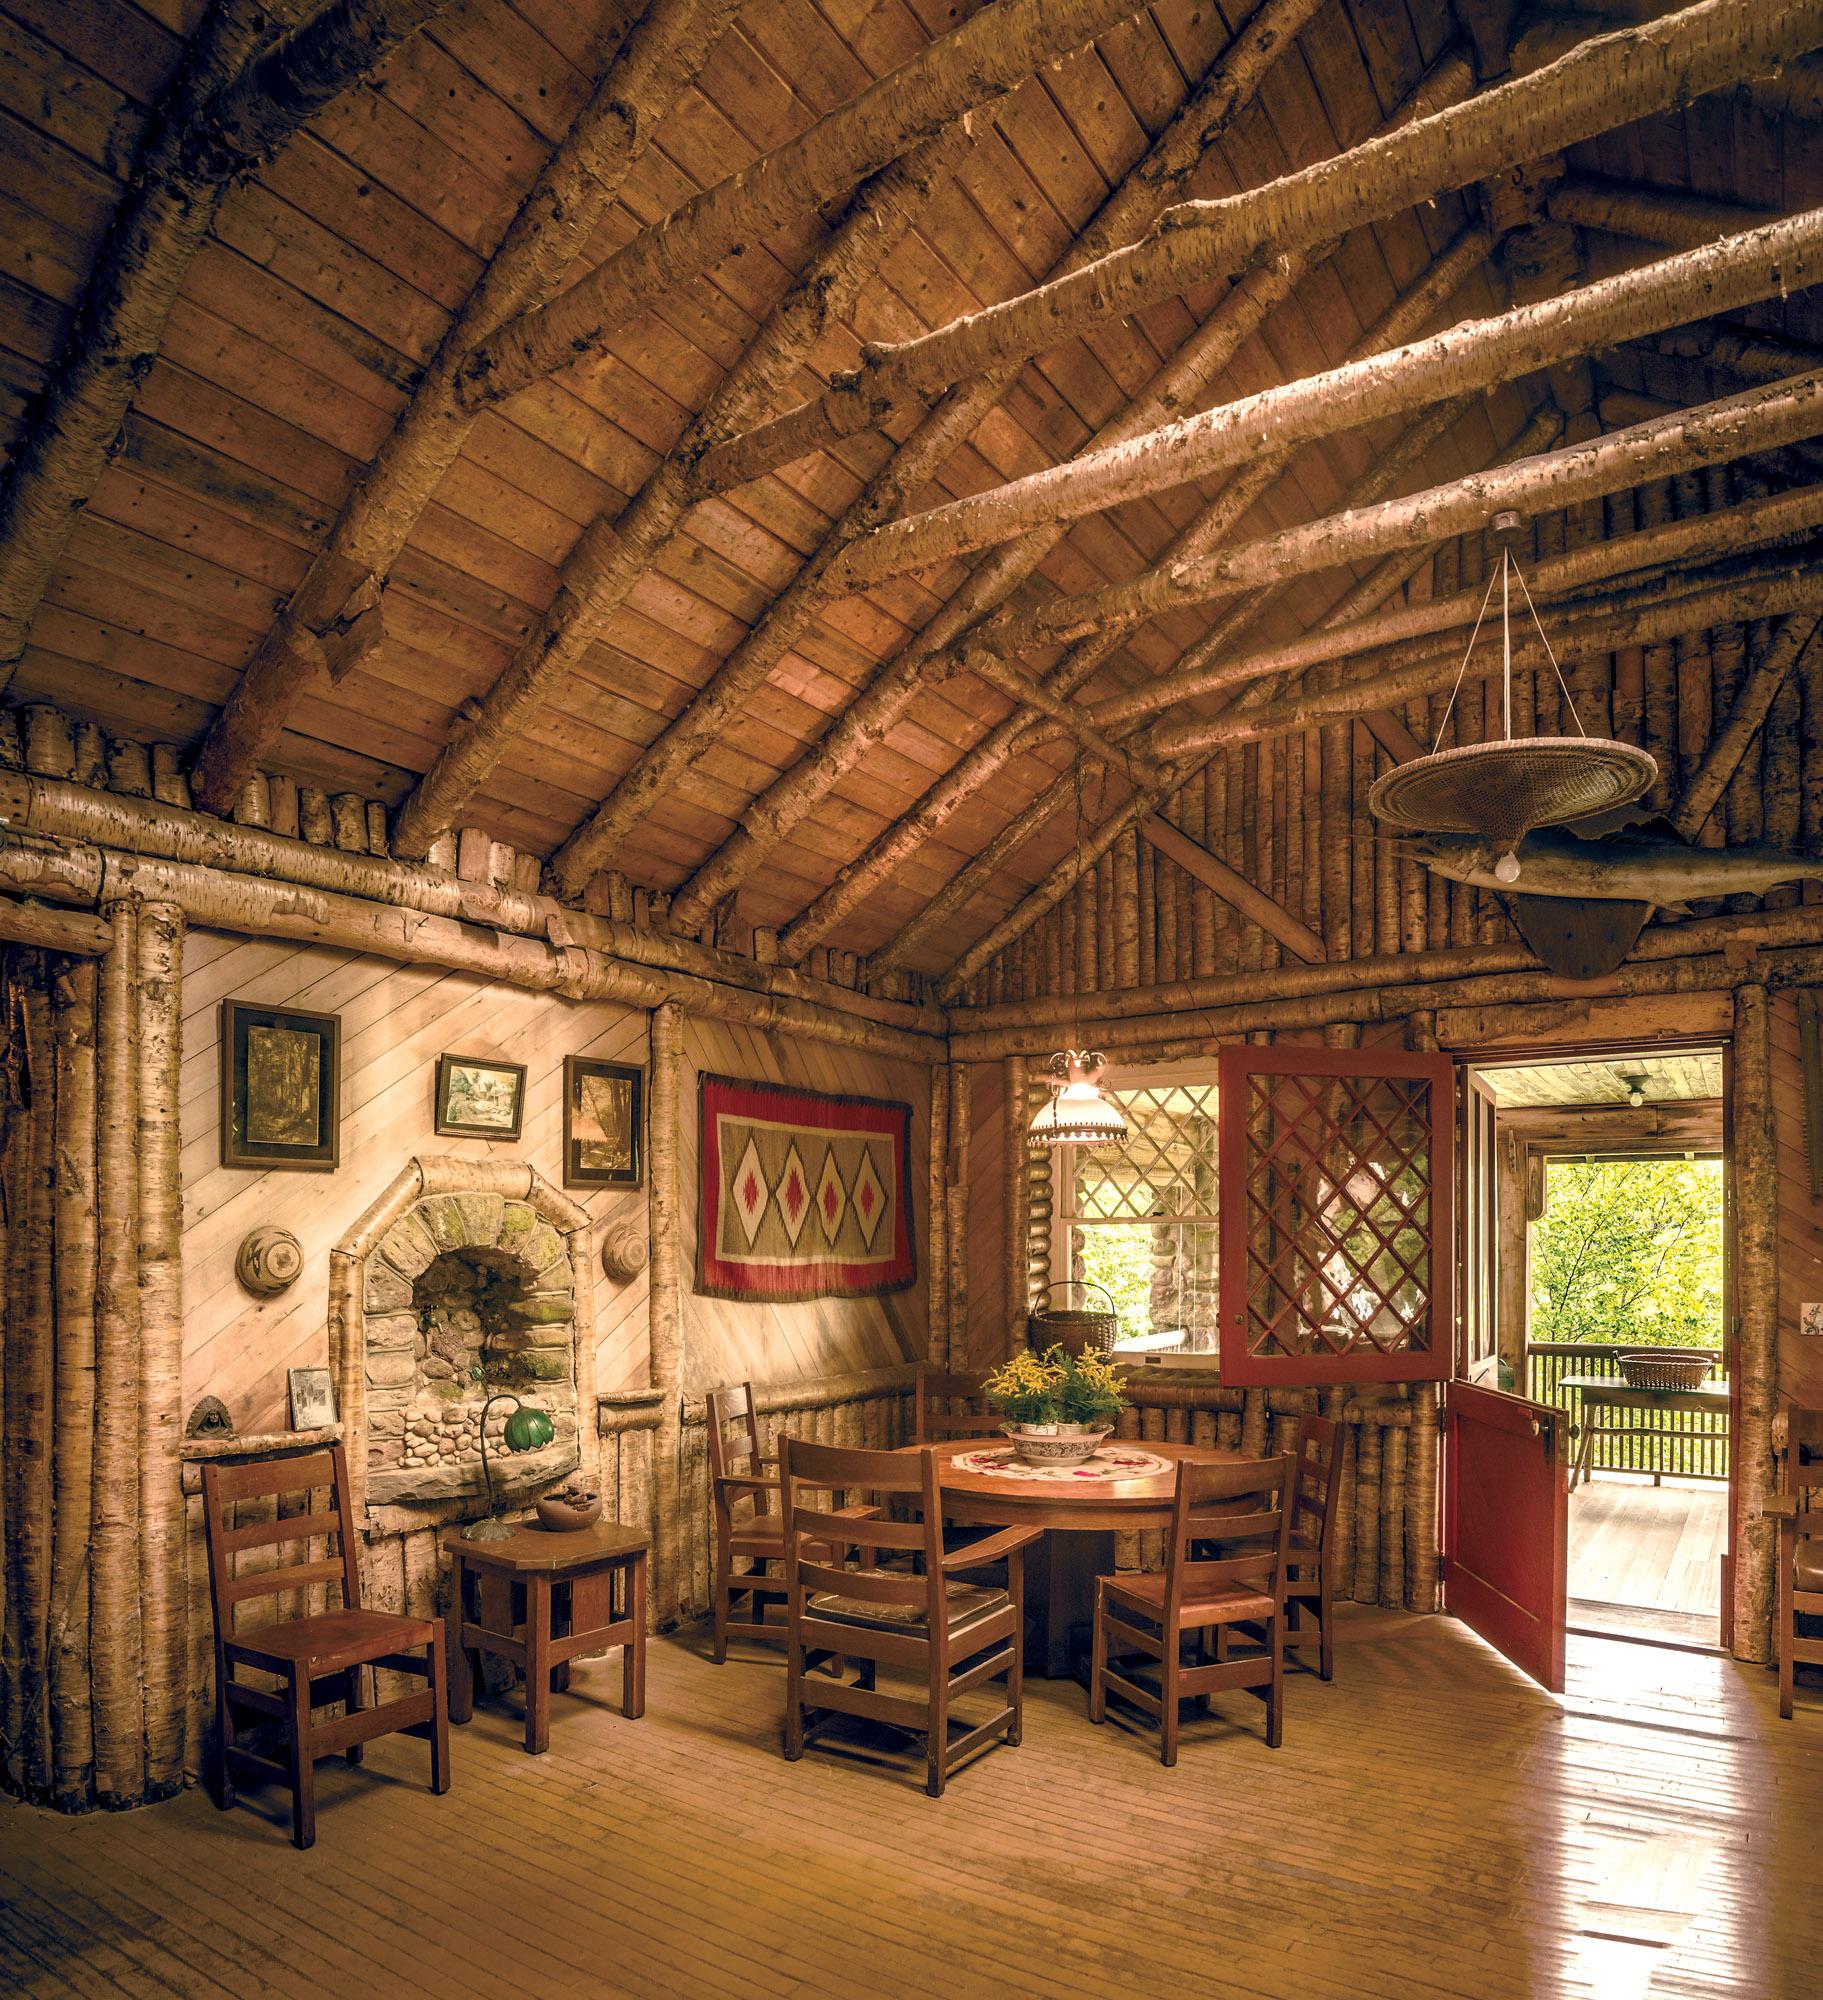 Casa Mañana: Castle Camp in the Woods